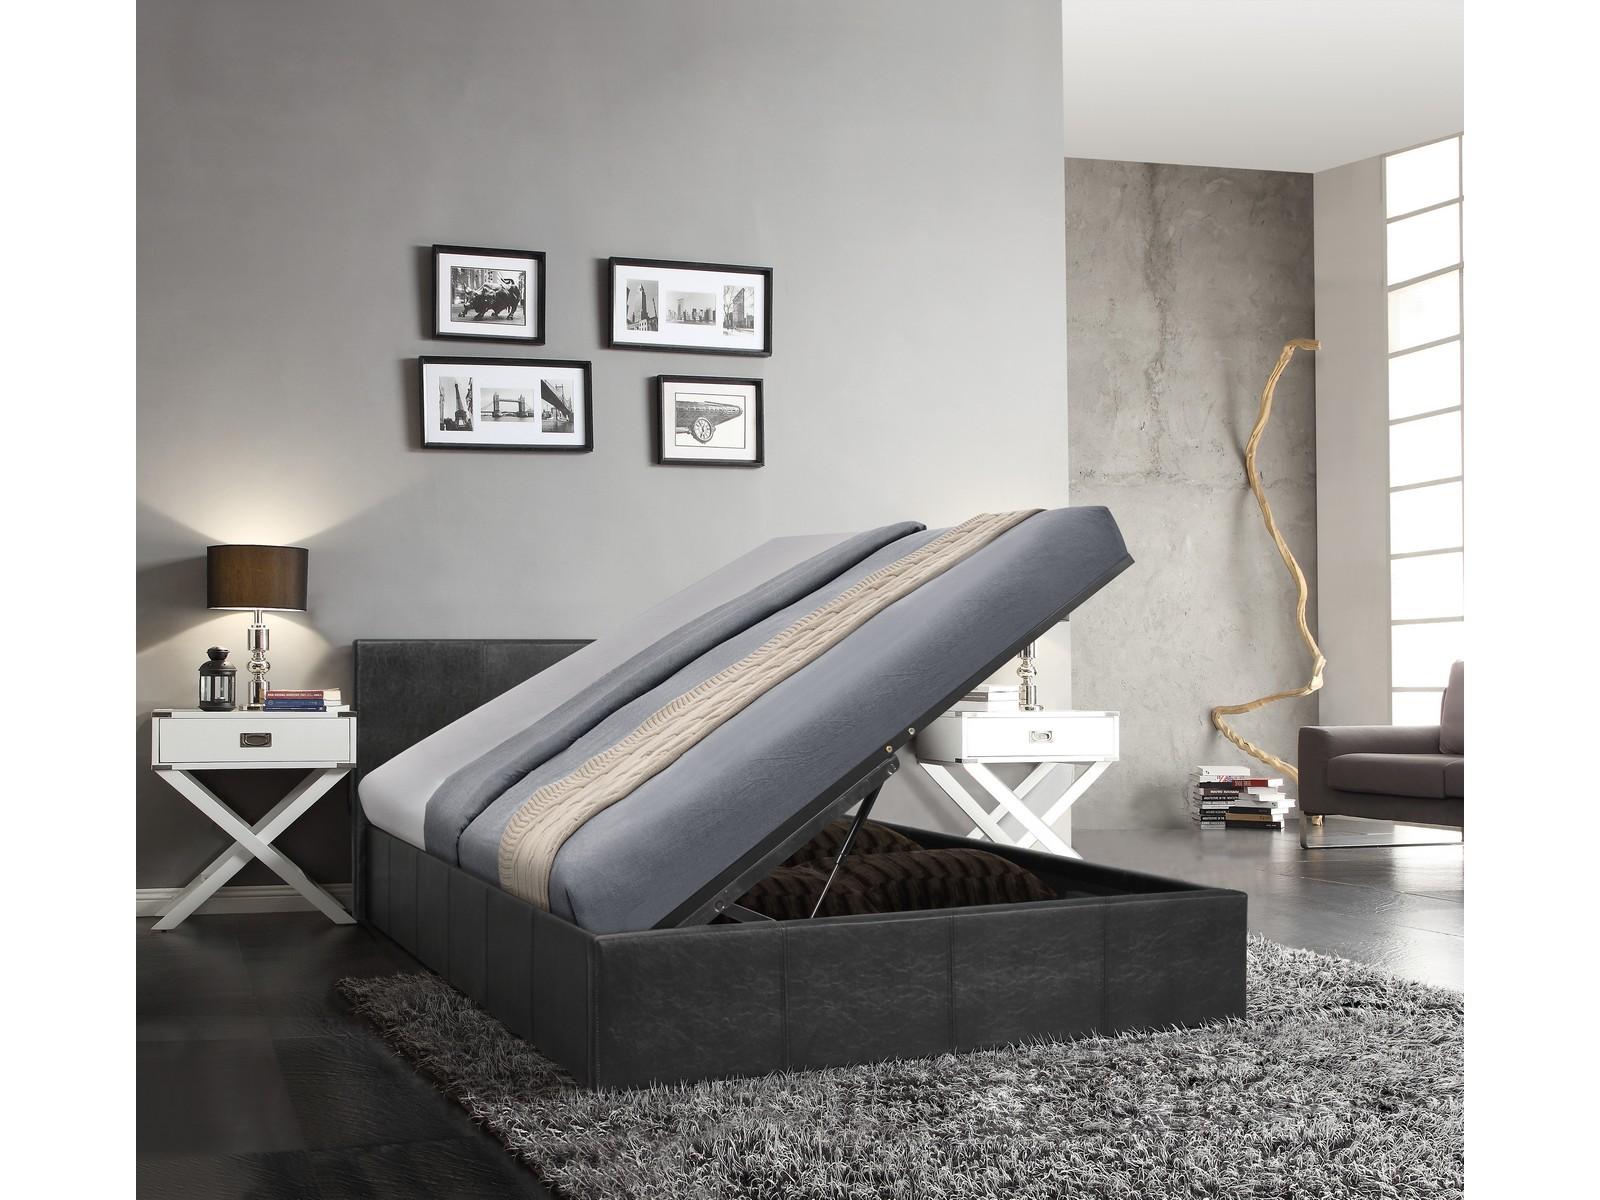 Cool Details About Gator Side Lift Ottoman Bed Mega Storage 4Ft6 Double Black Machost Co Dining Chair Design Ideas Machostcouk